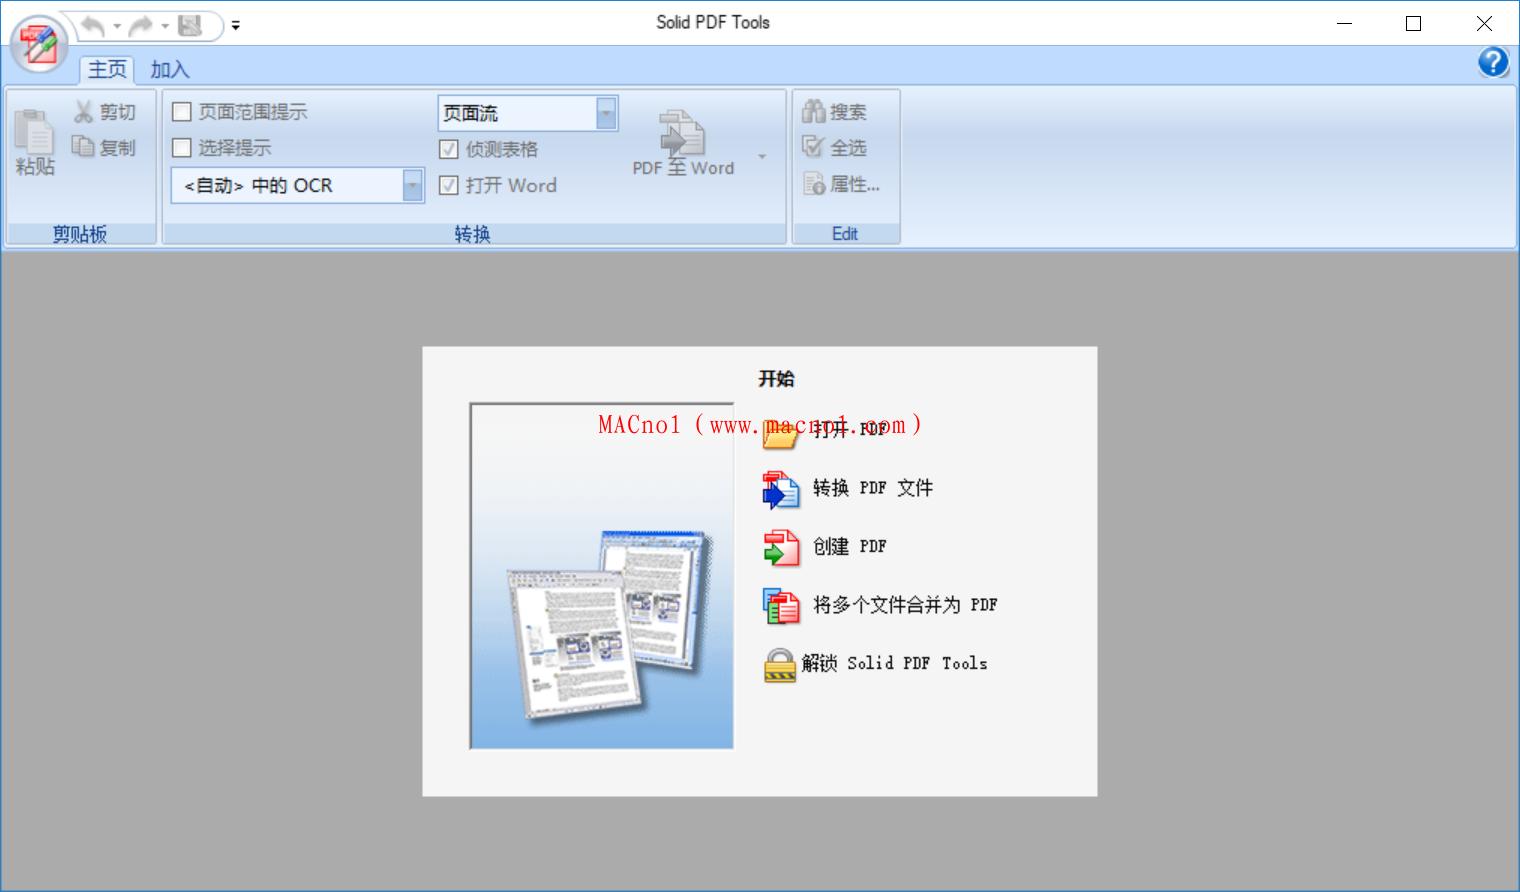 Solid PDF Tools.png